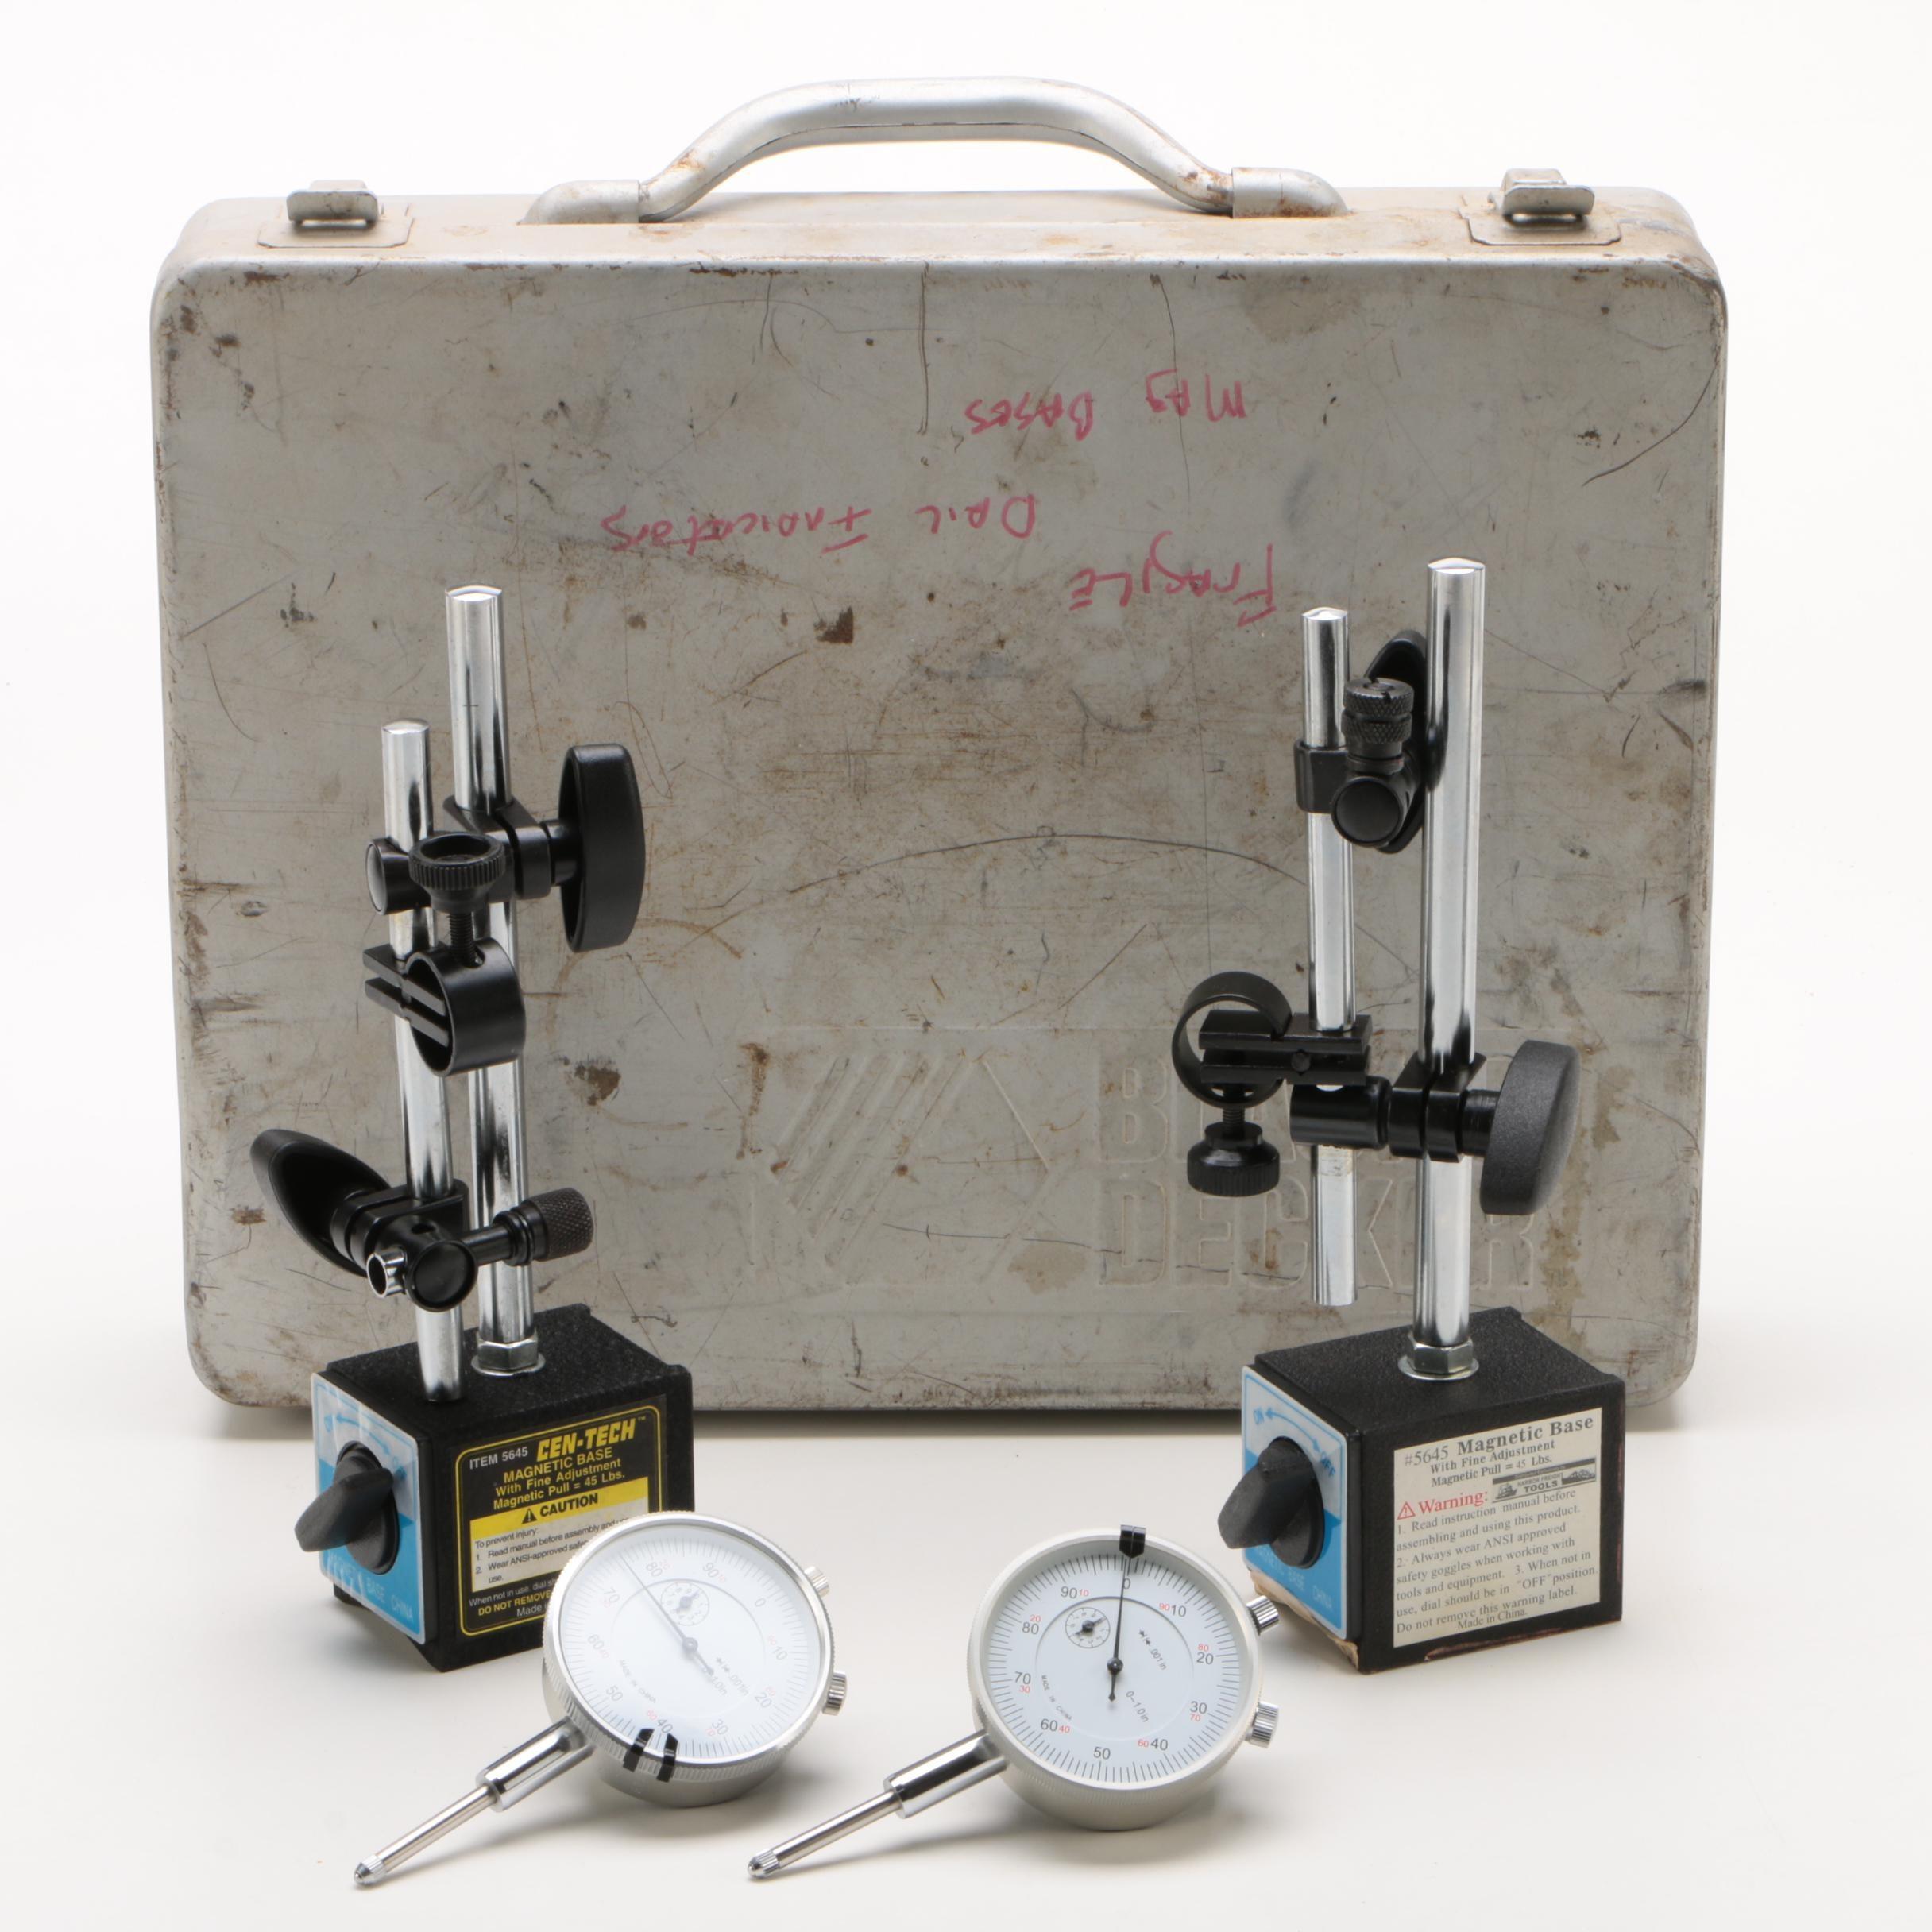 Cen-Tech Fine Adjustment Magnetic Bases with Black & Decker Case